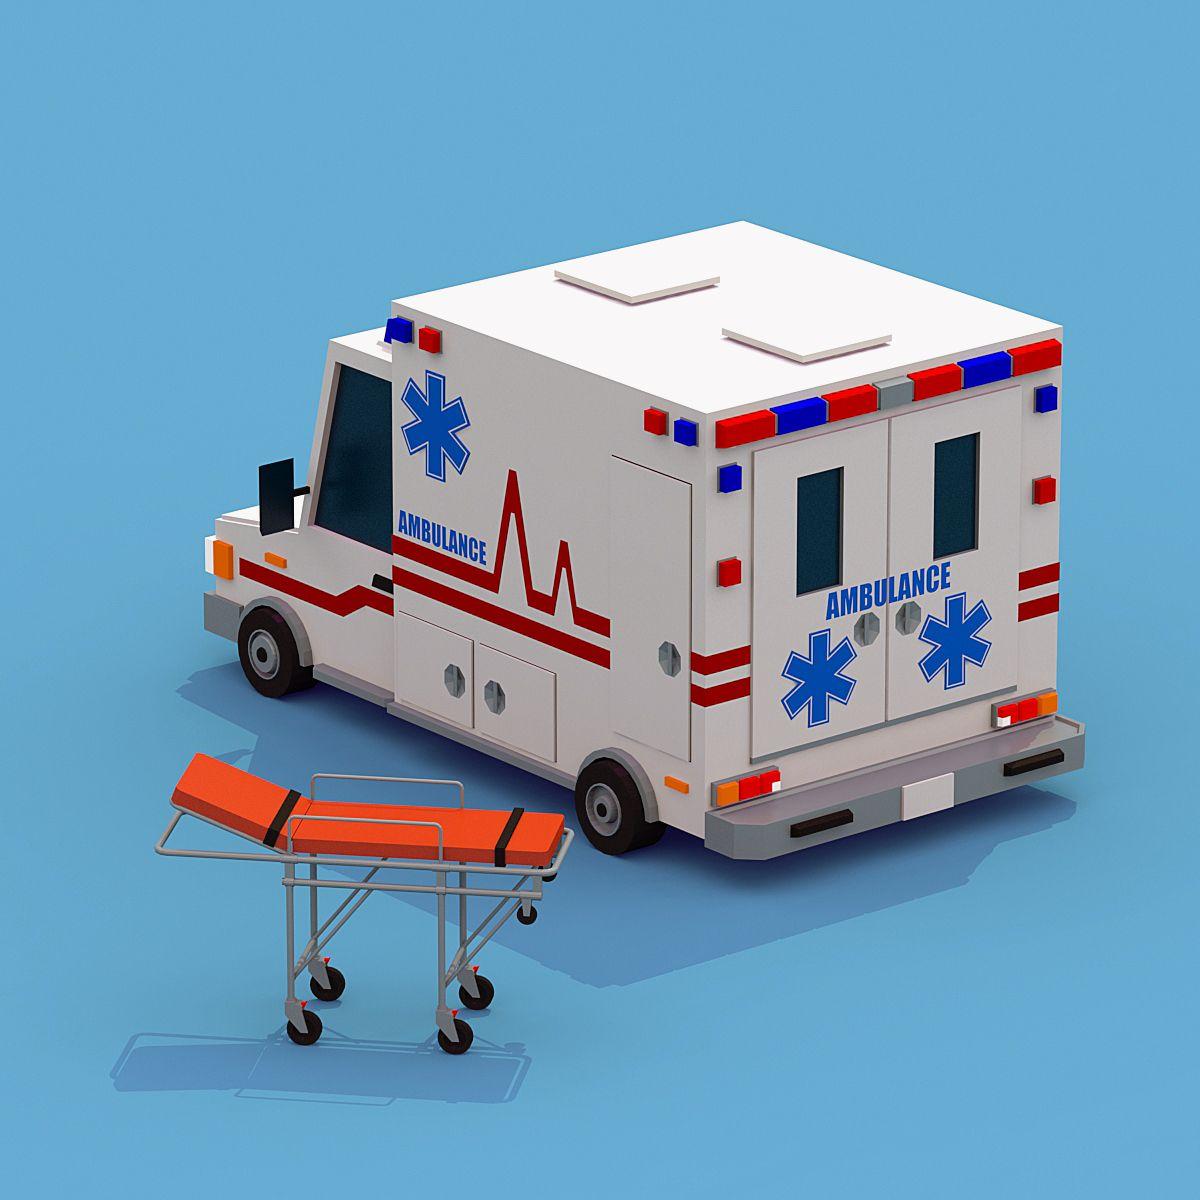 Ambulance with Stretcher 구급차